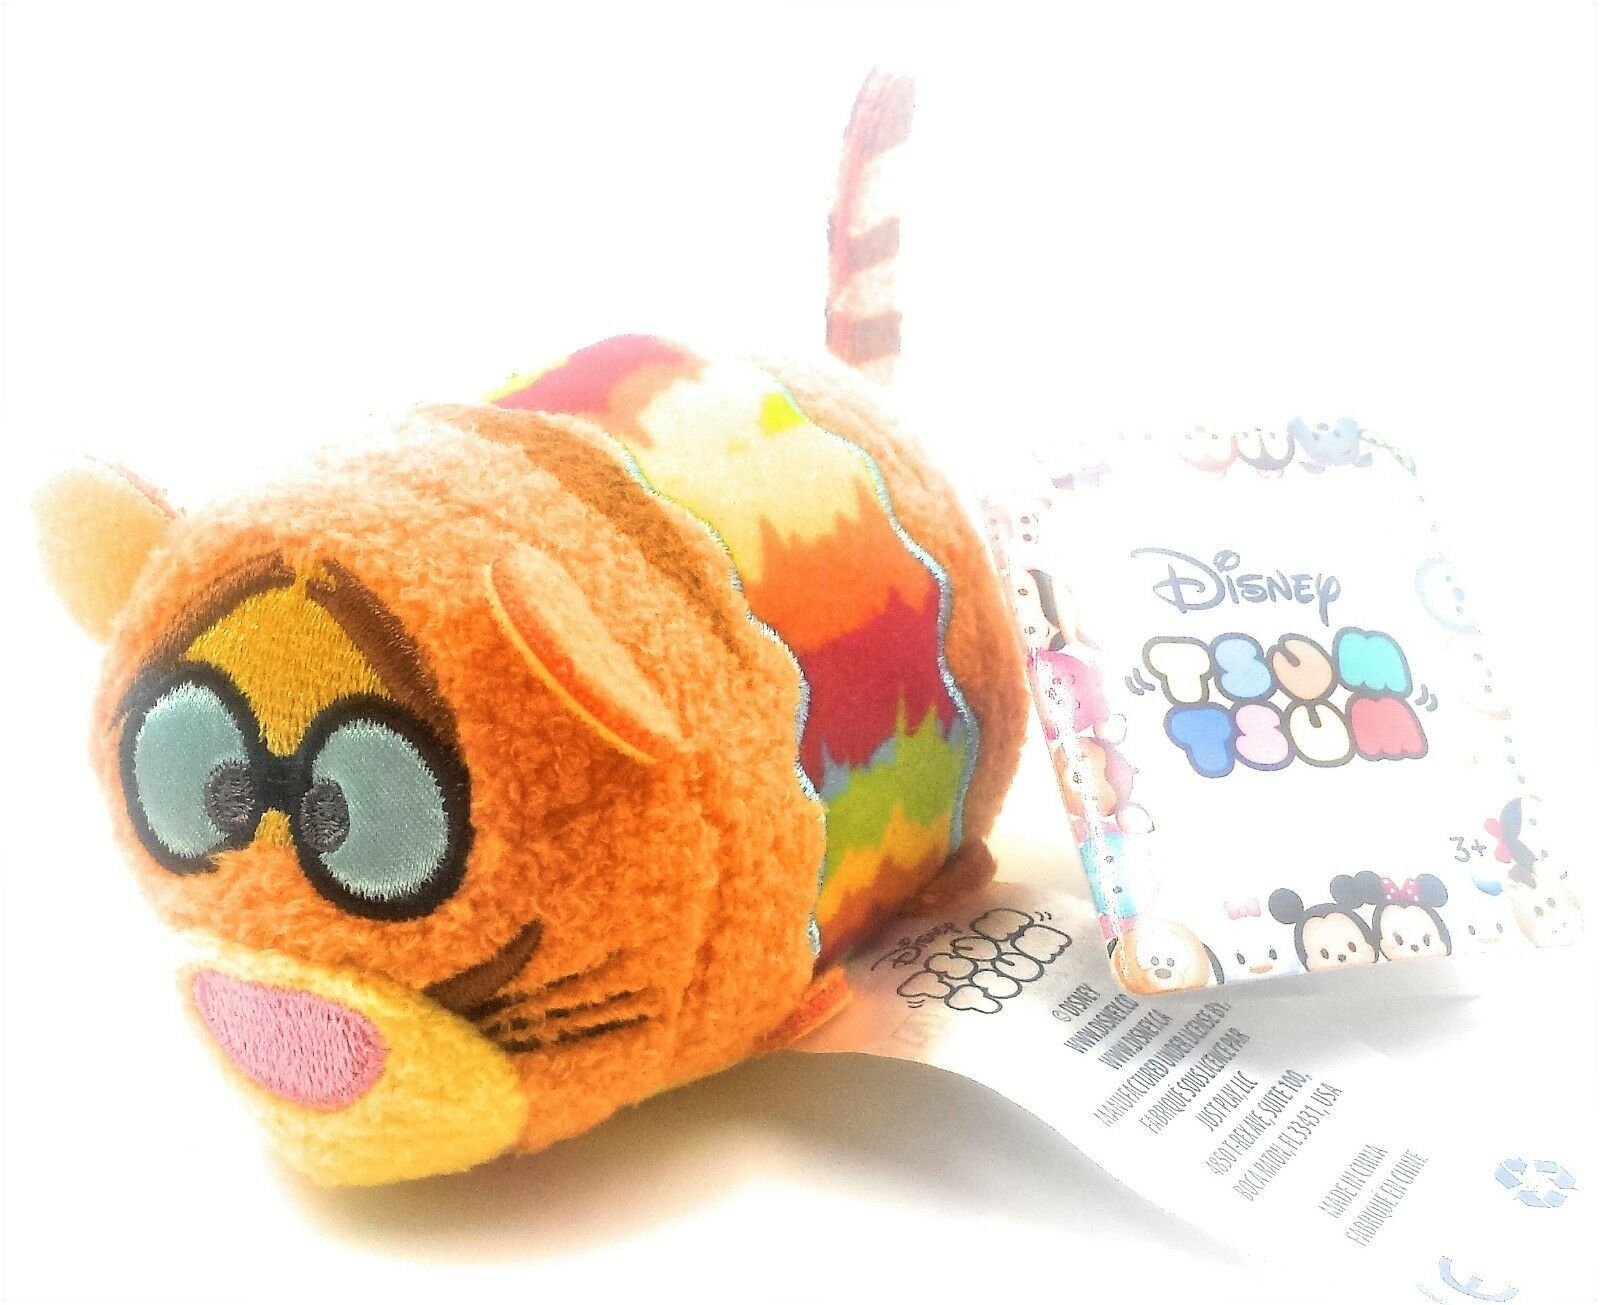 Disney Target Mini Tsum Tsum Groovy Pals Hippie Retro Flower Power Tigger Plush